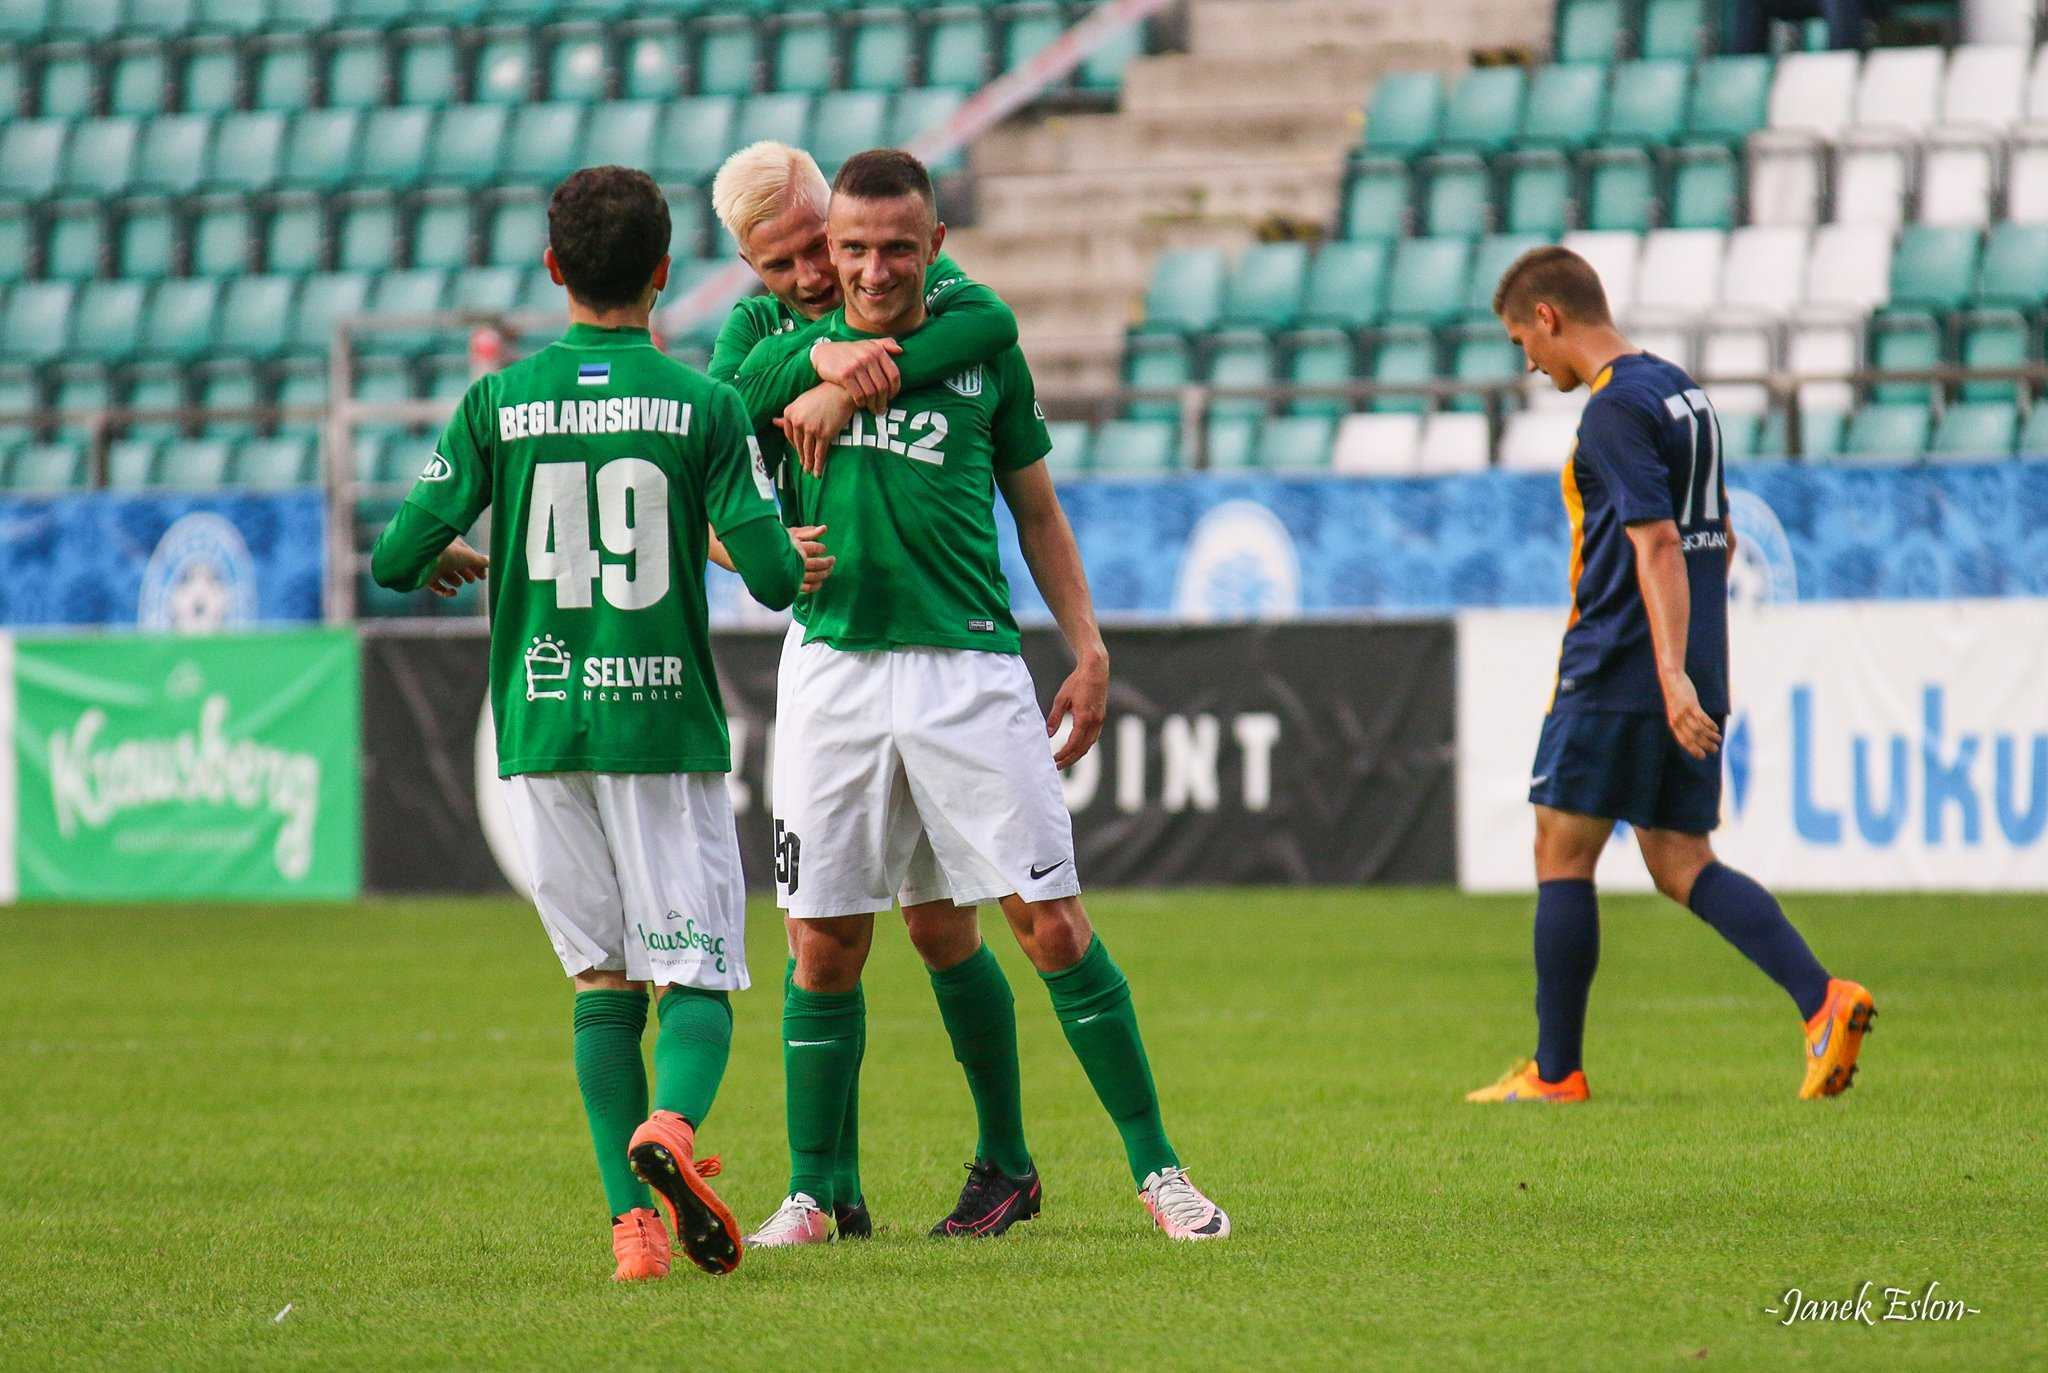 Zakaria Beglarishvili, Henri Järvelaid ja Maksim Gussev vs Narva Trans 6.augustil 2016